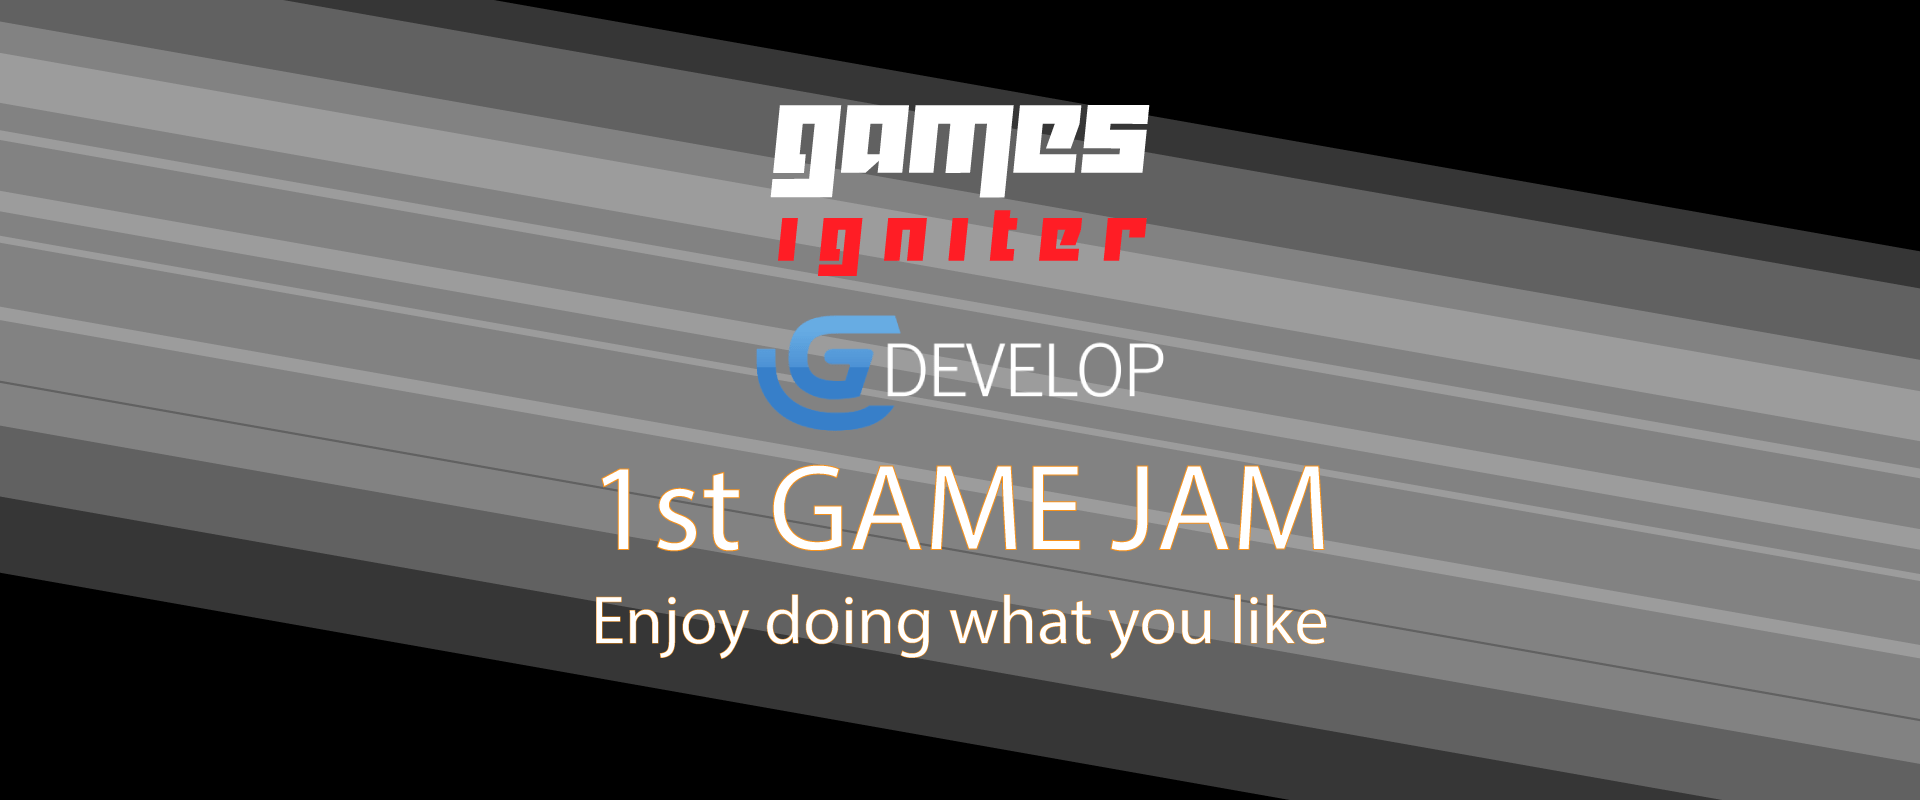 gamesigniter gamejam header 1920 - Games Igniter